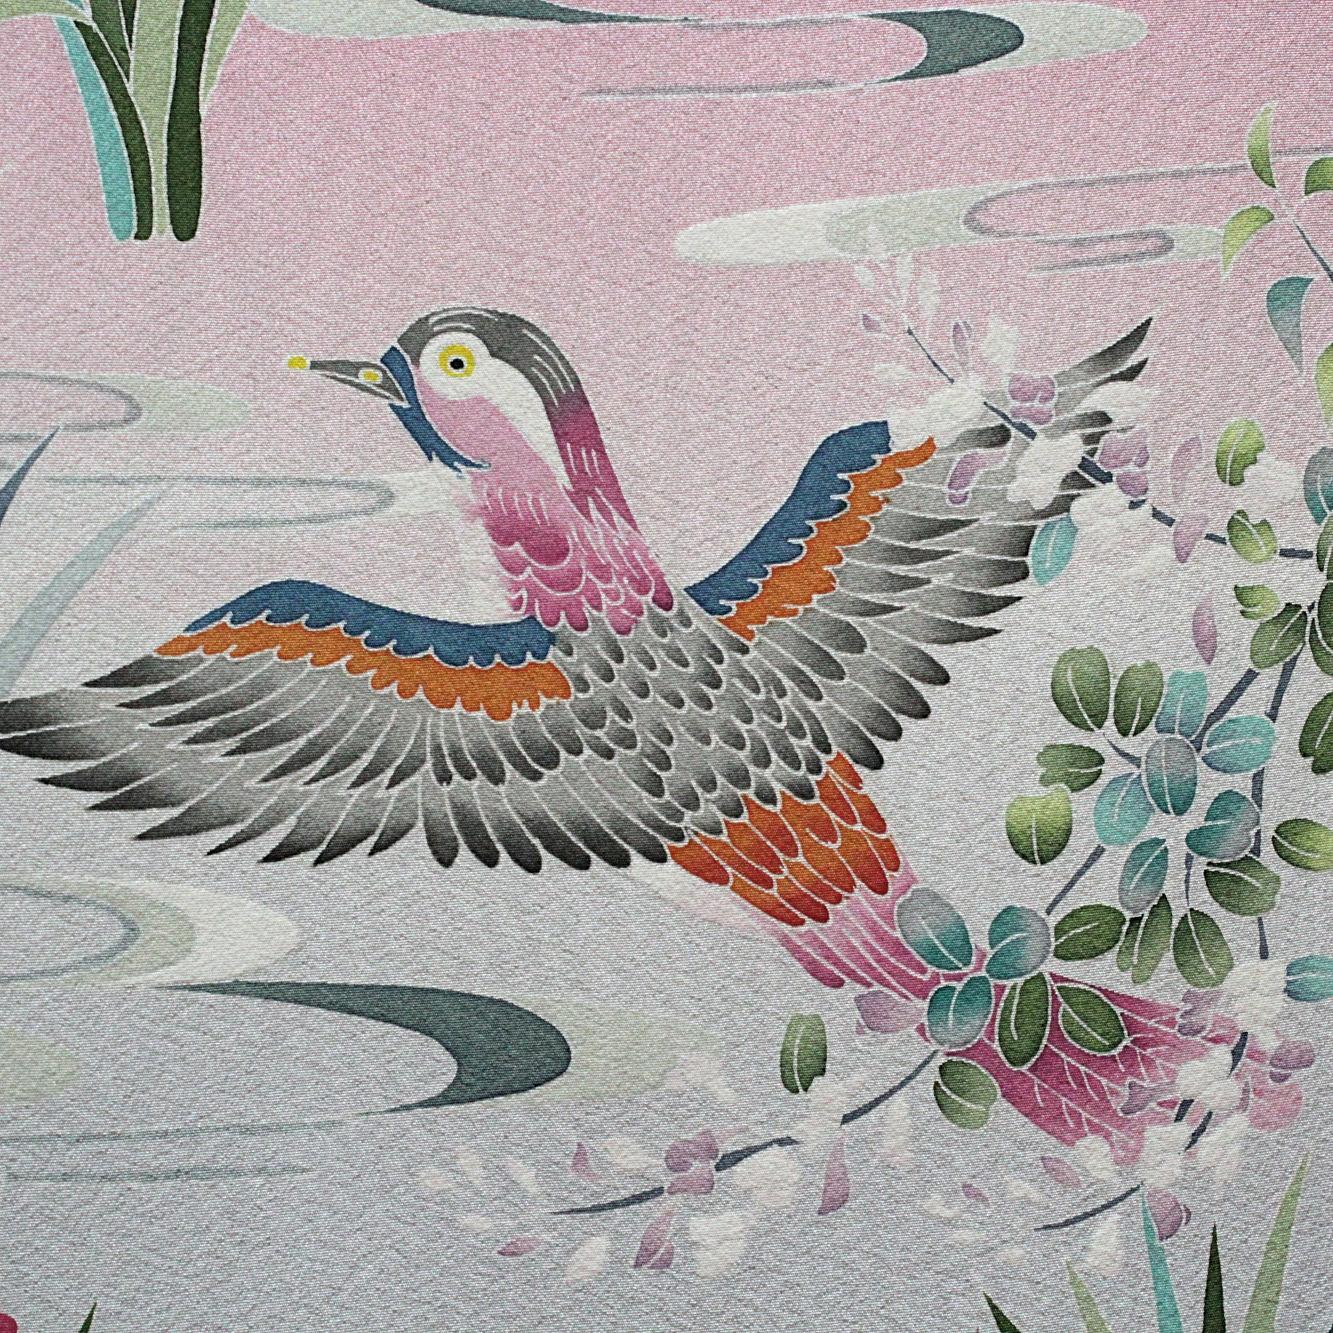 Kaga-yuzen silk painting of a female duck